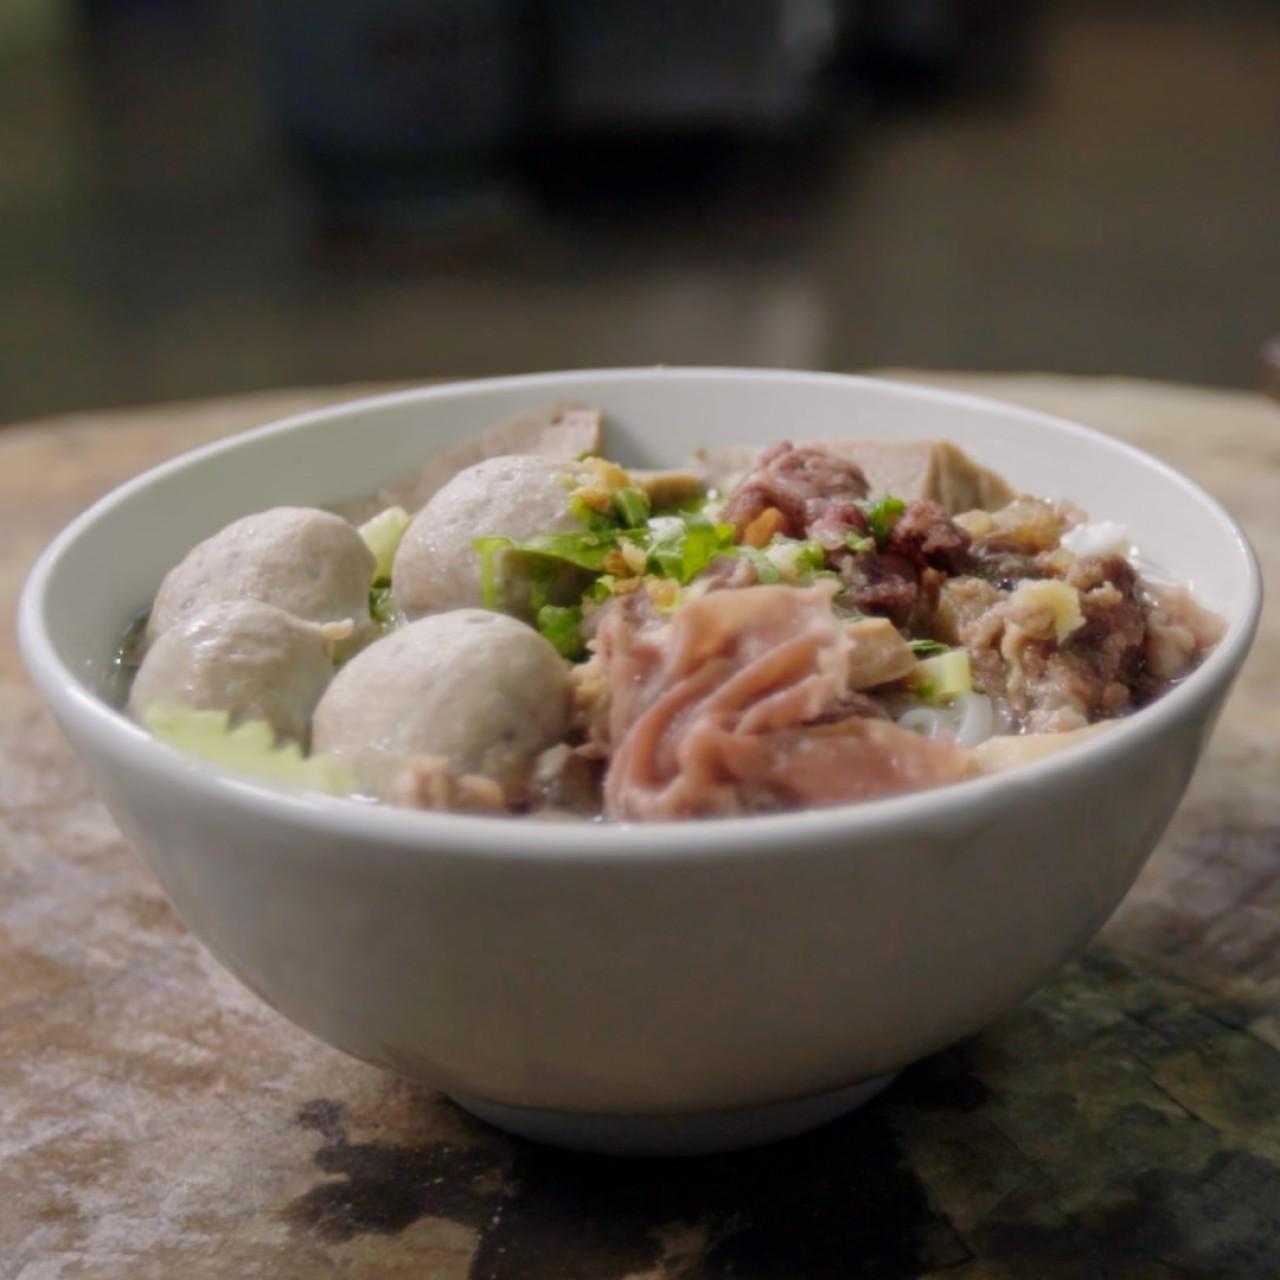 In Netflix series Flavorful Origins: Chaoshan Cuisine, Chiu Chow